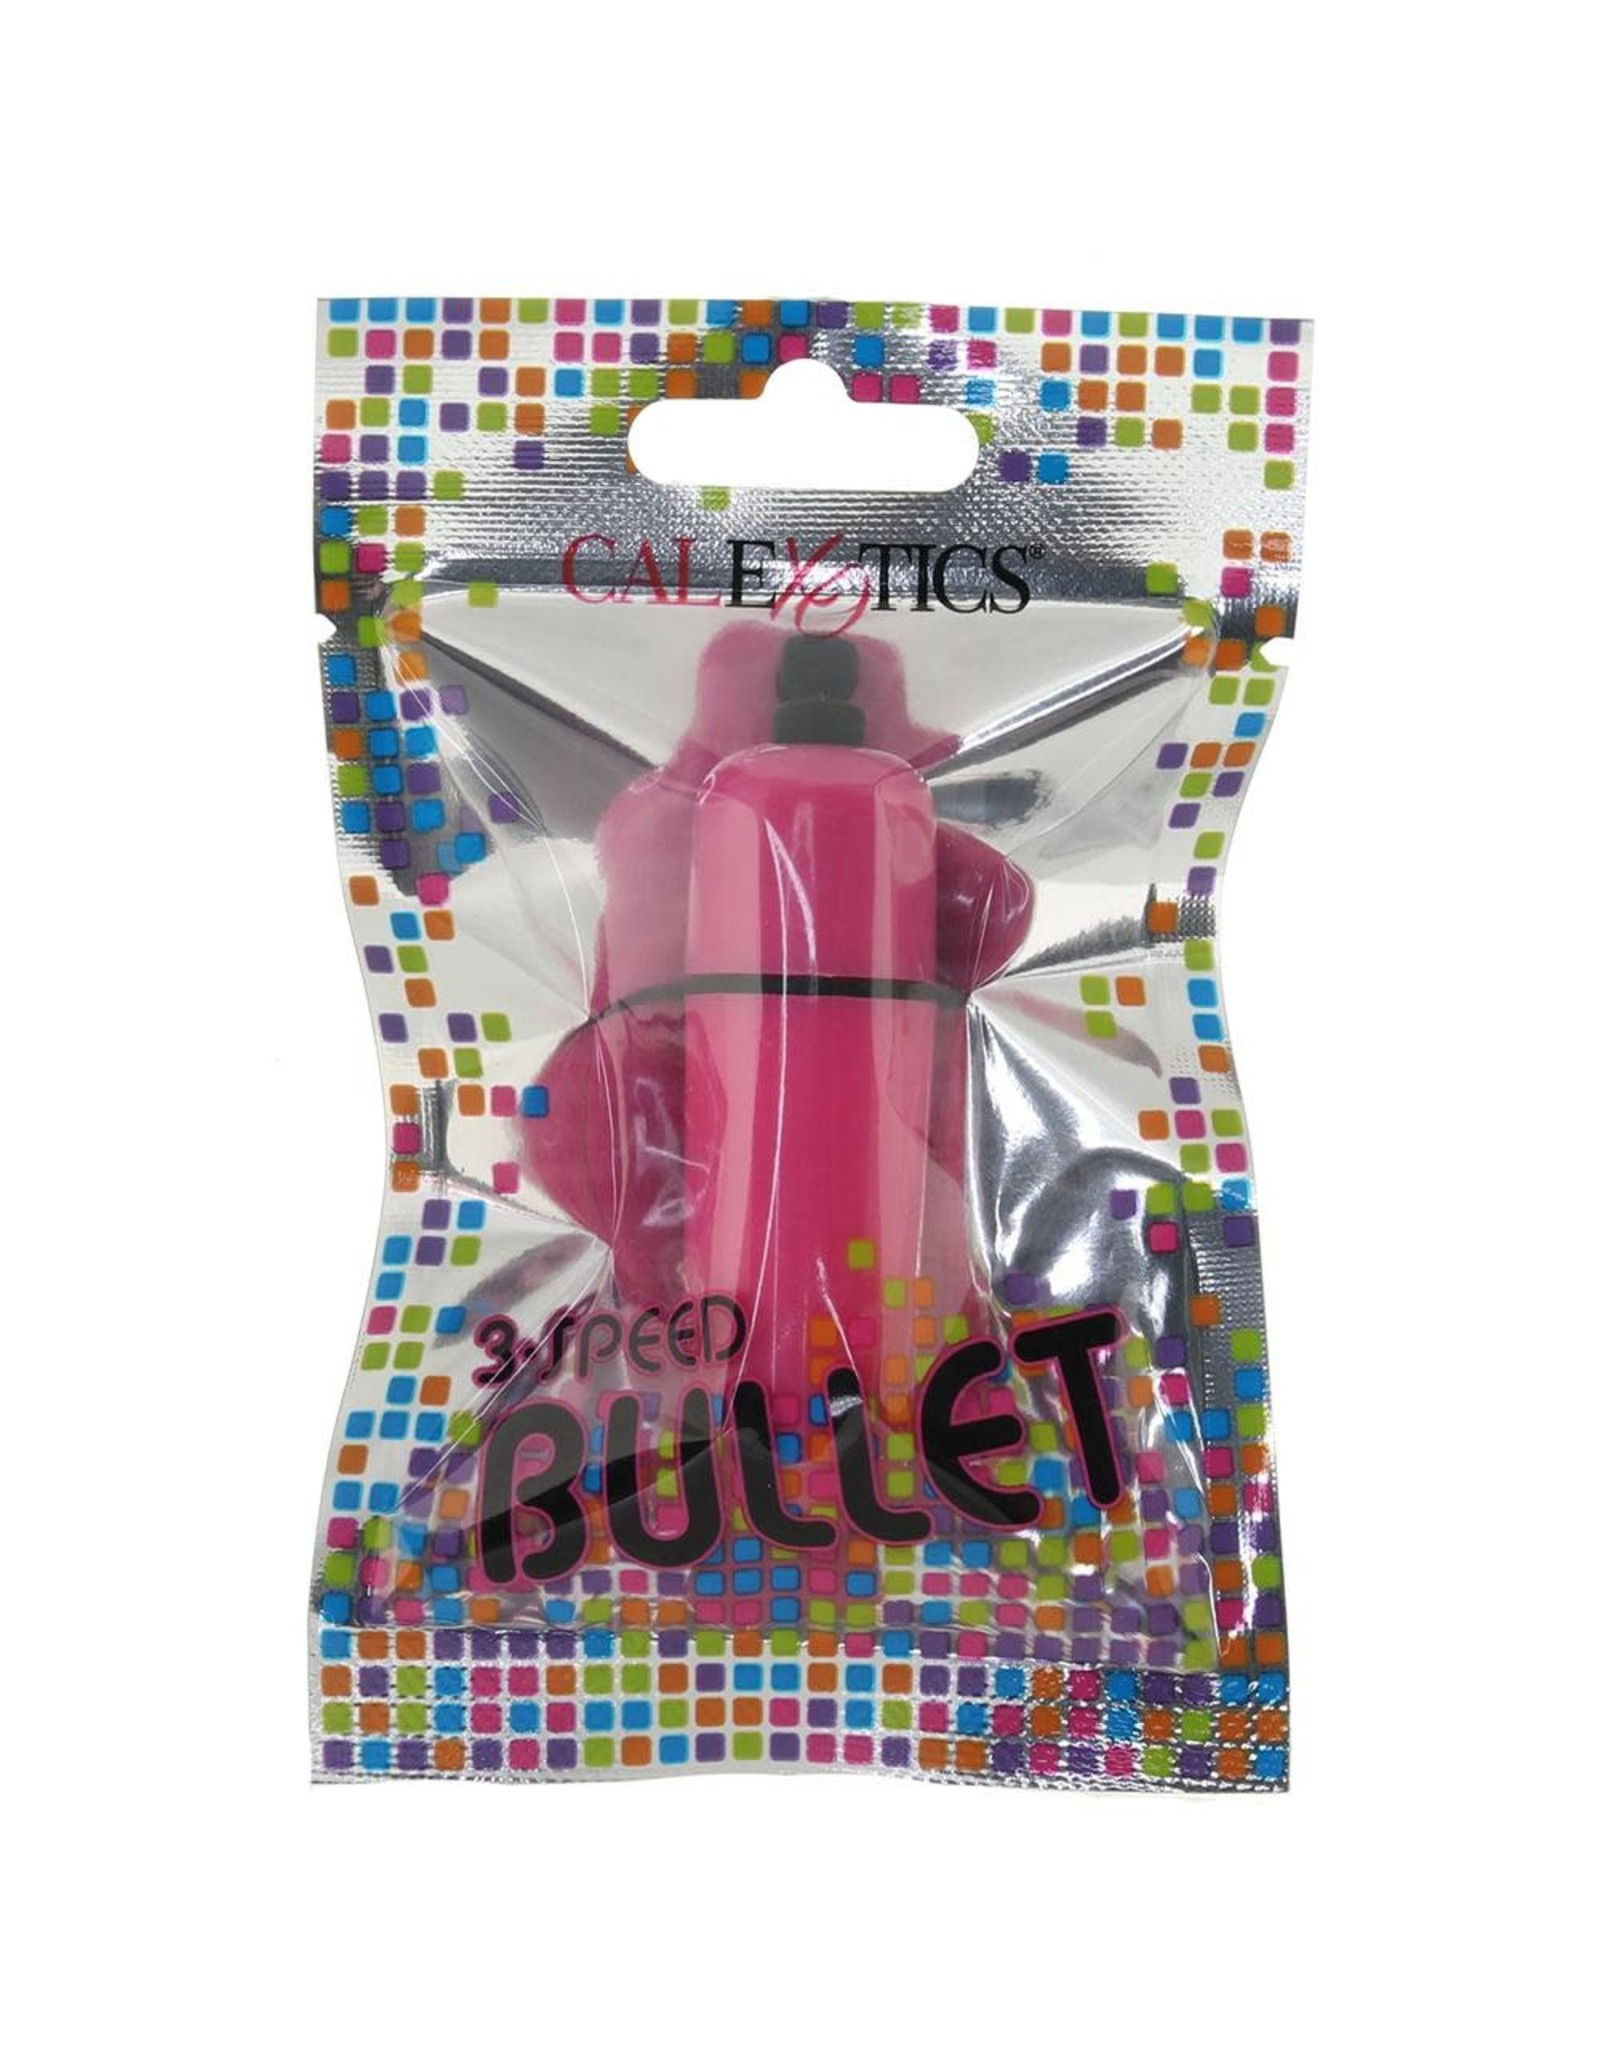 CALEXOTICS CALEXOTICS - FOIL PACK 3-SPEED BULLET - PINK